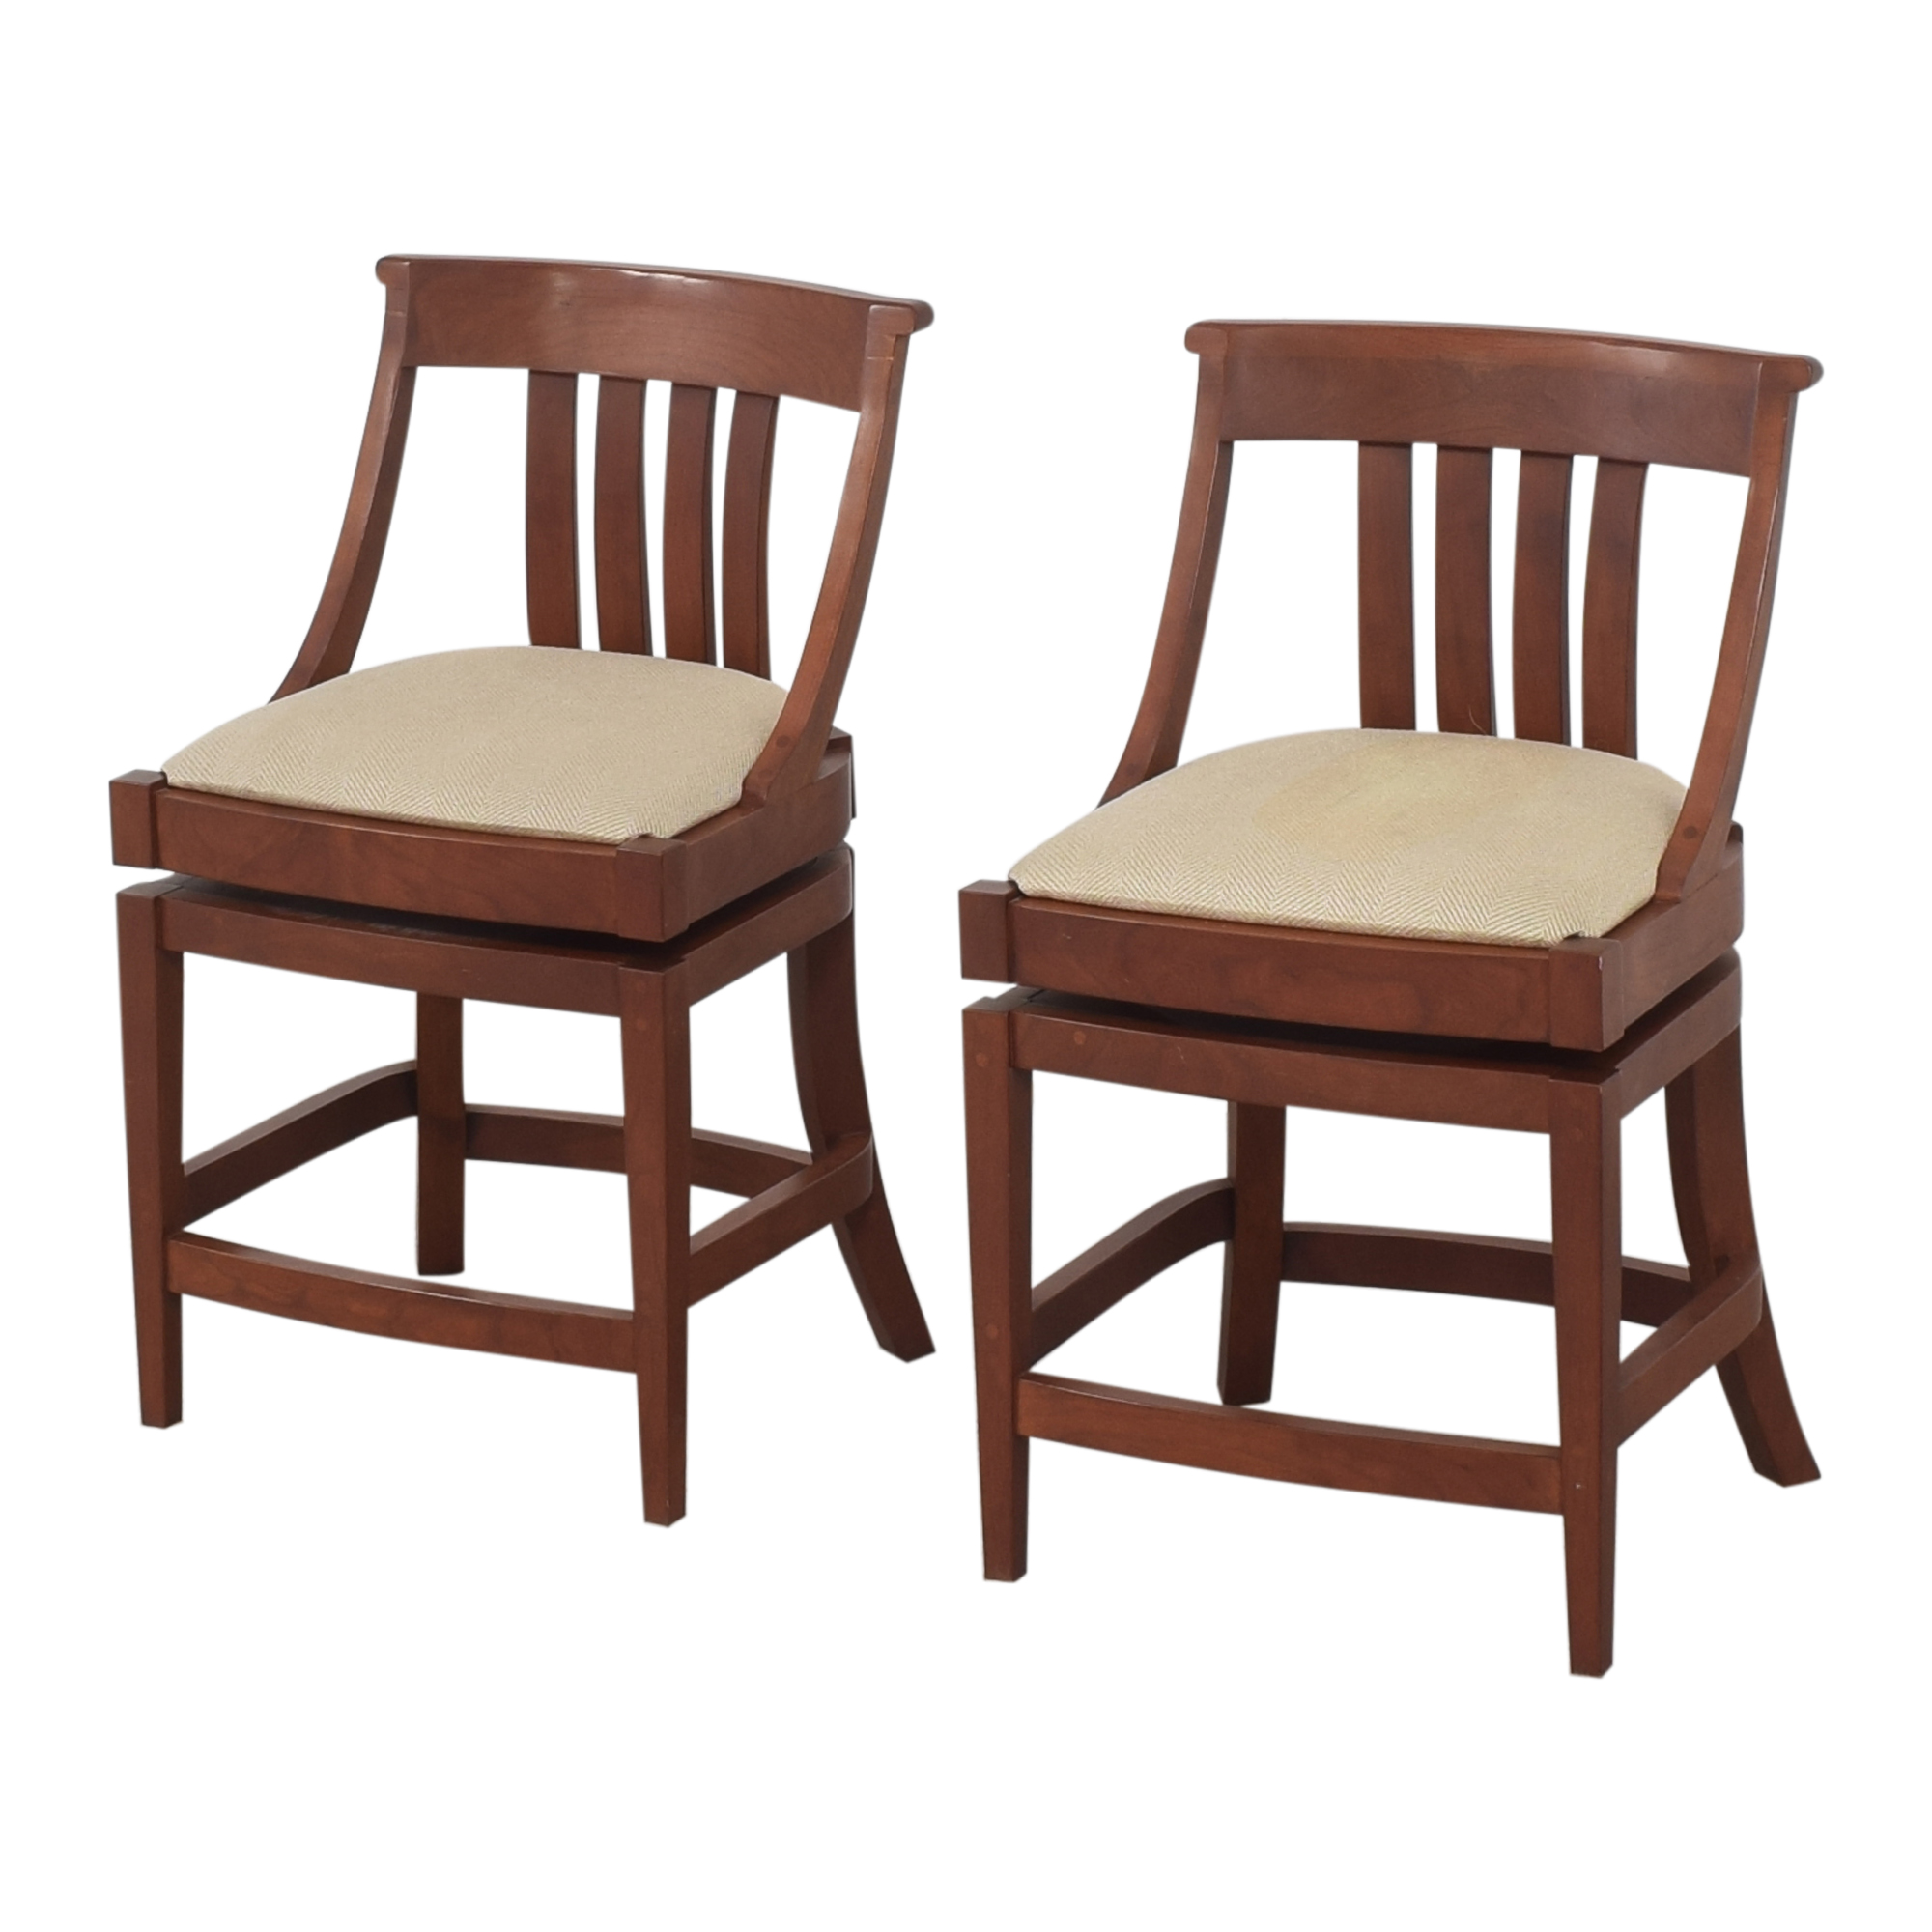 Custom Swivel Dining Stools / Dining Chairs